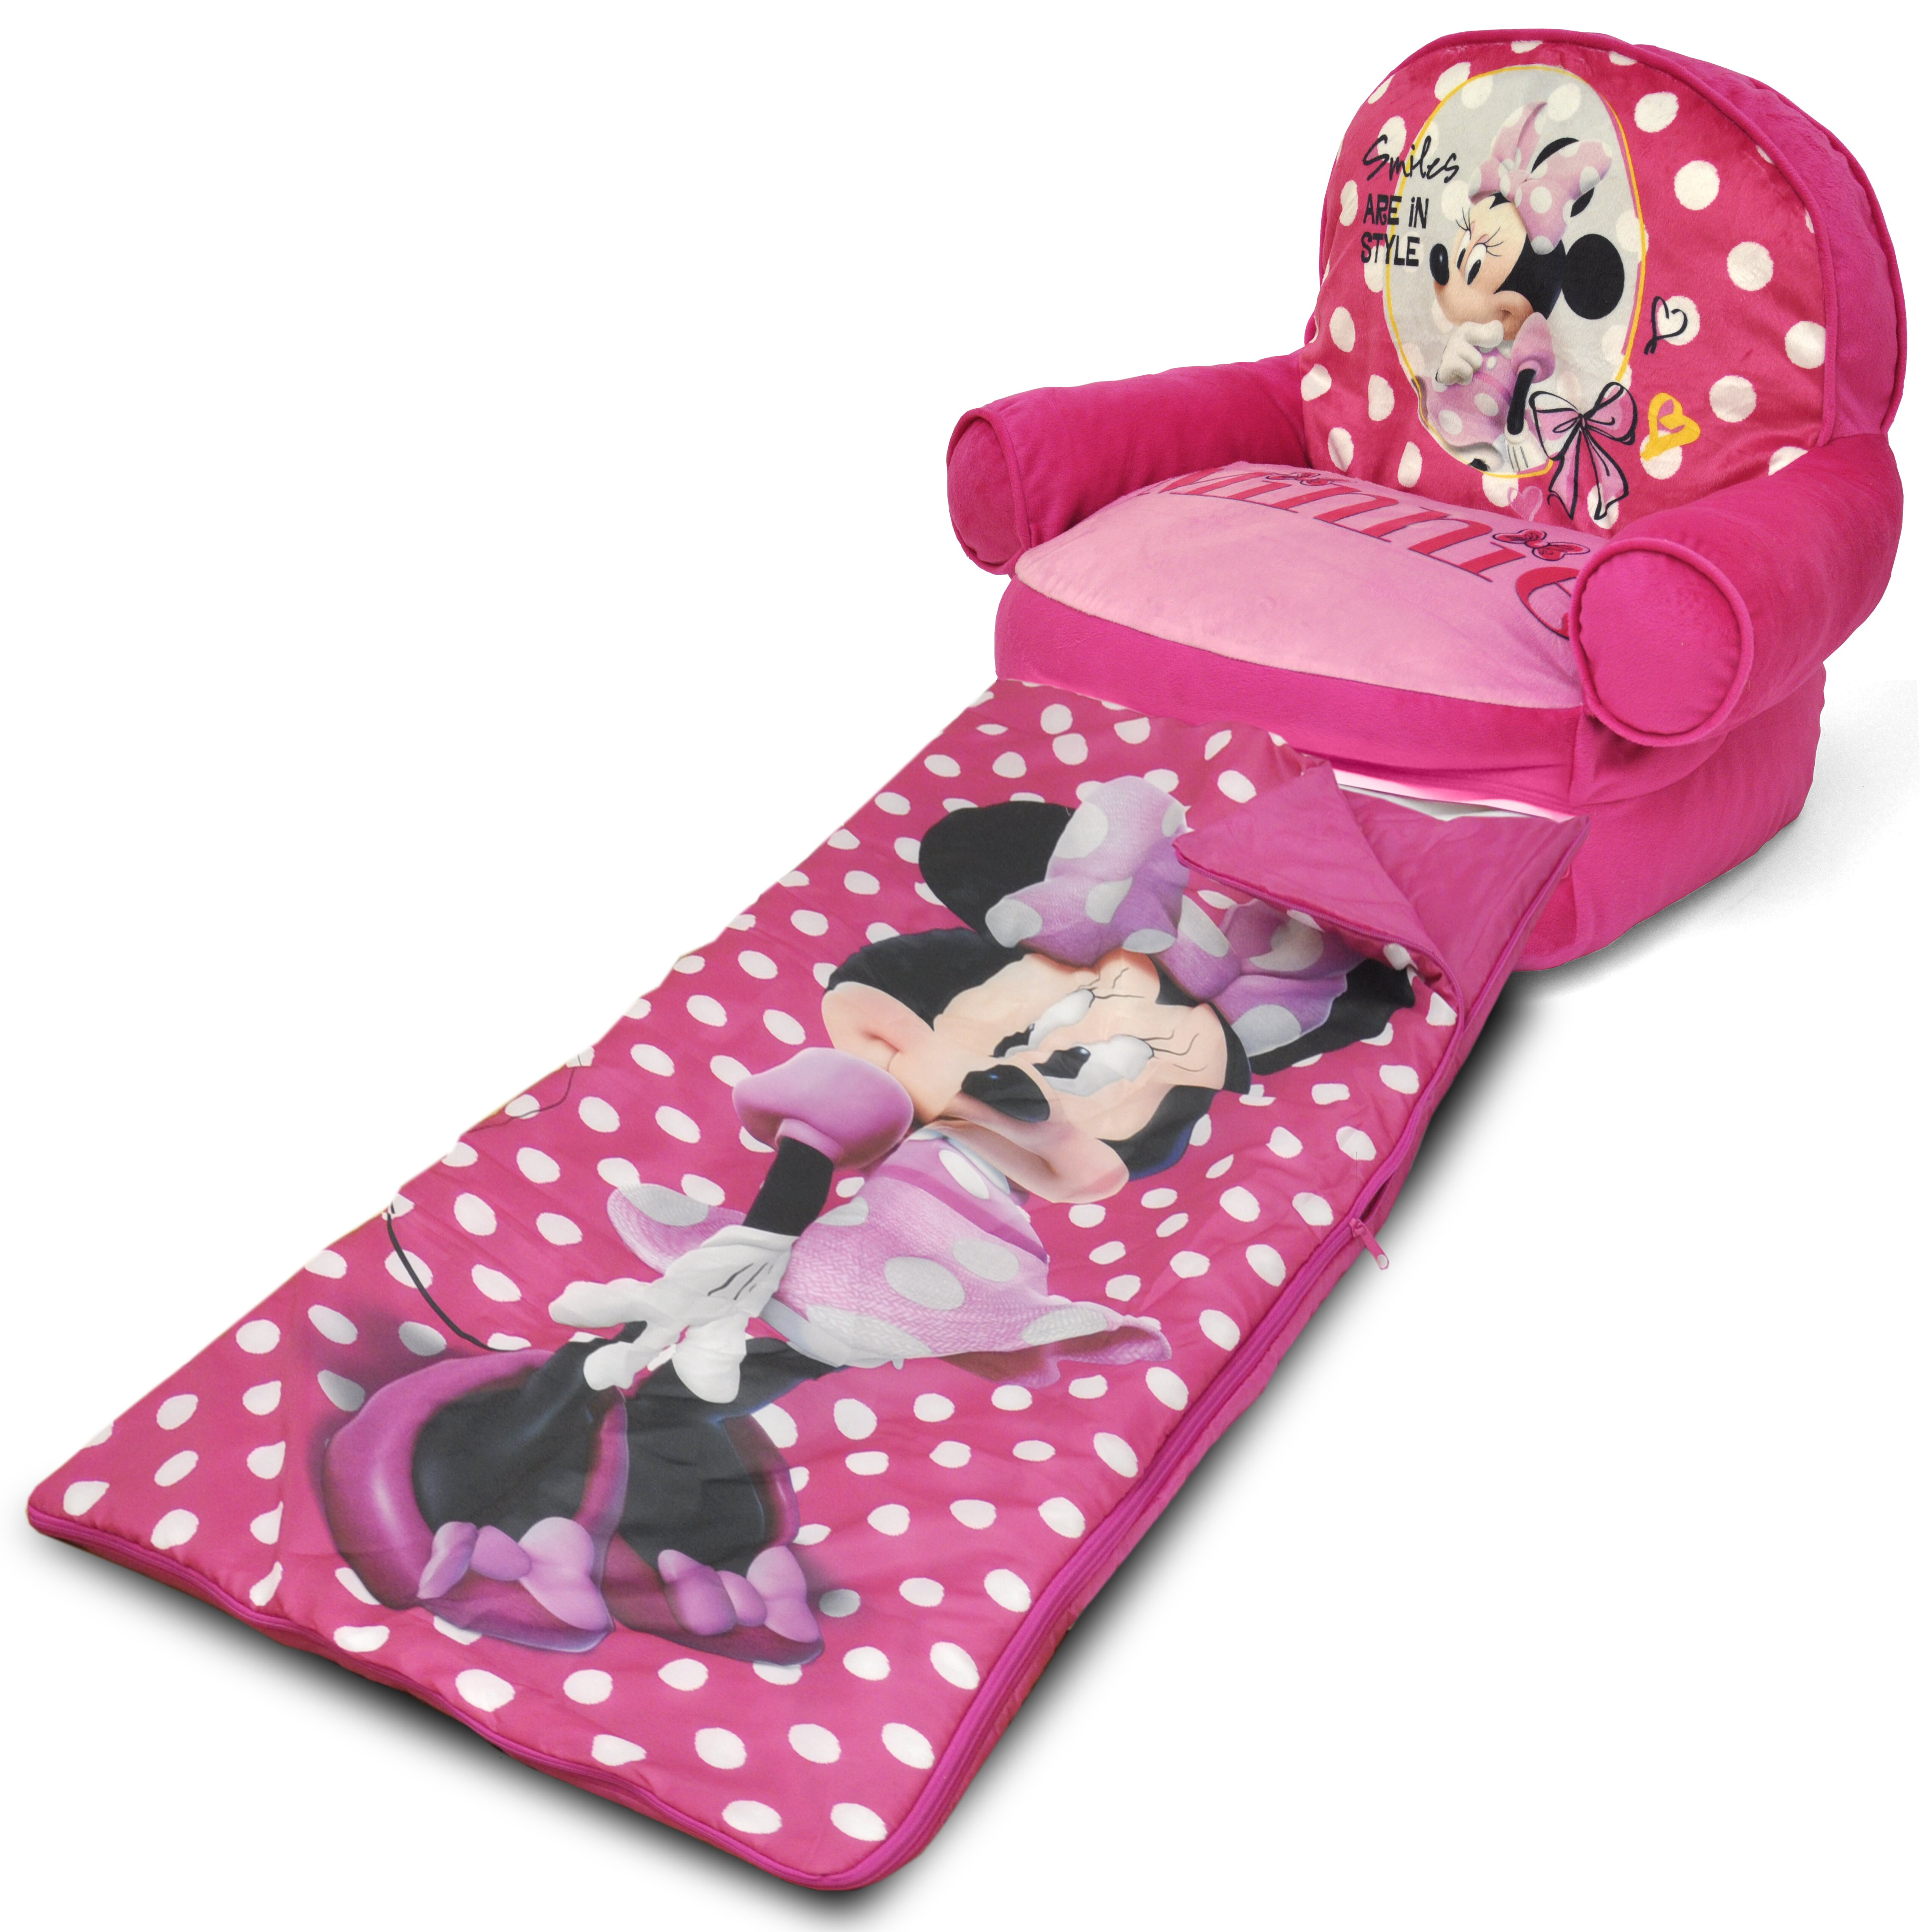 Minnie Mouse Kids Bean Bag Arm Chair With Bonus Sleeping